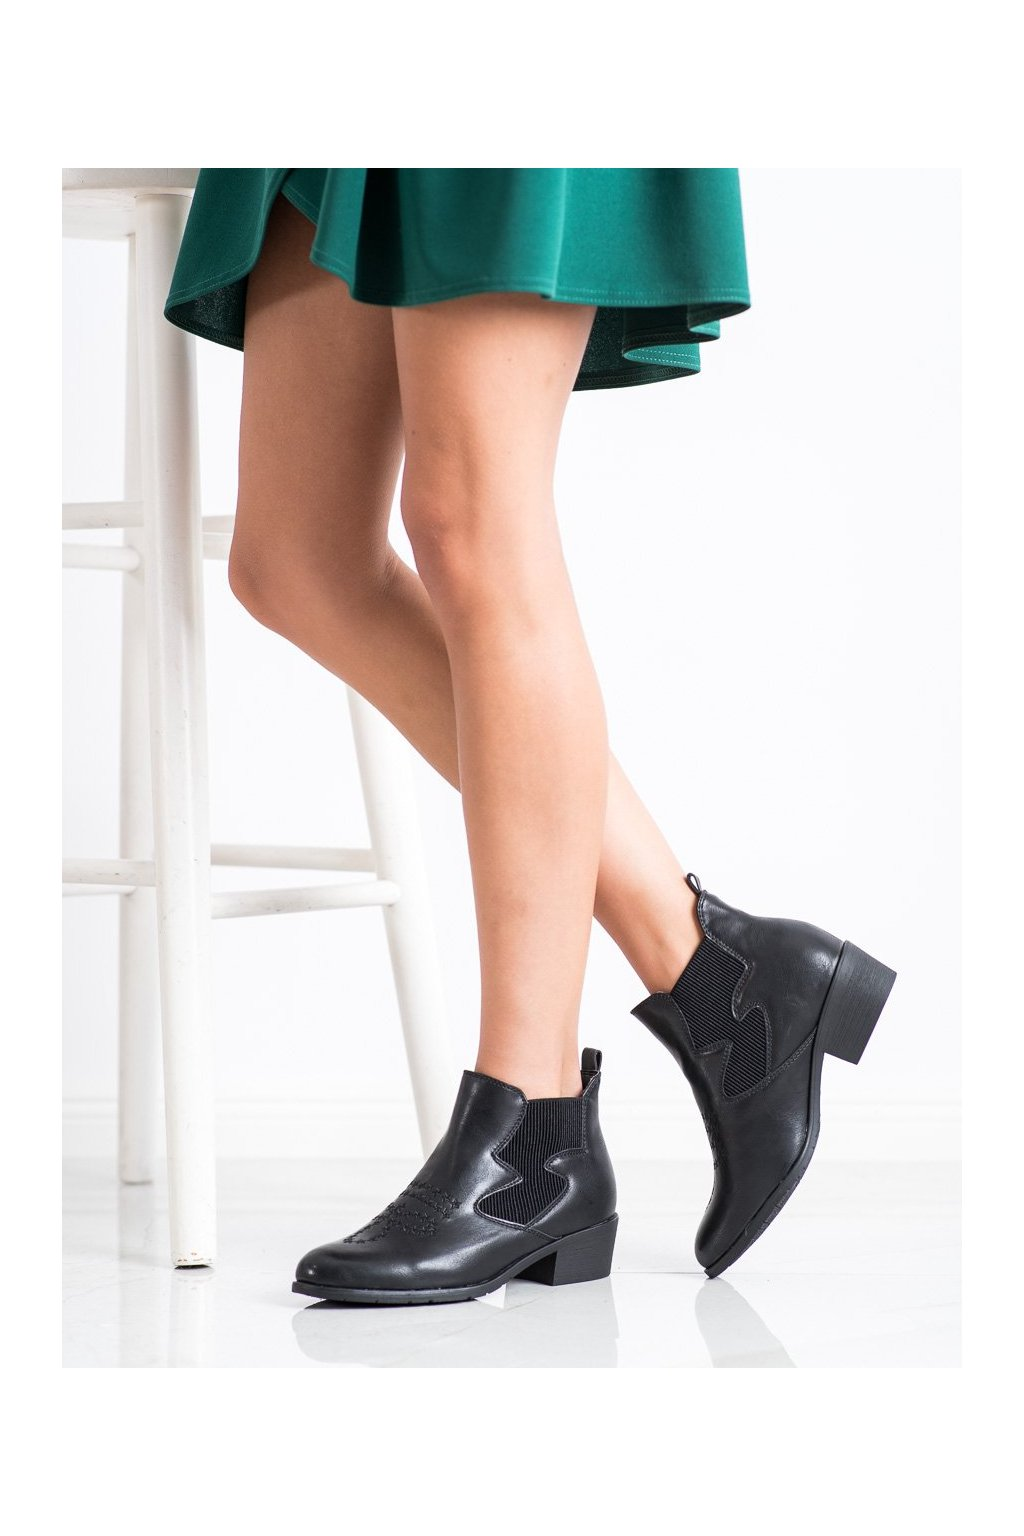 Čierne dámske topánky Weide NJSK HFN-7926B